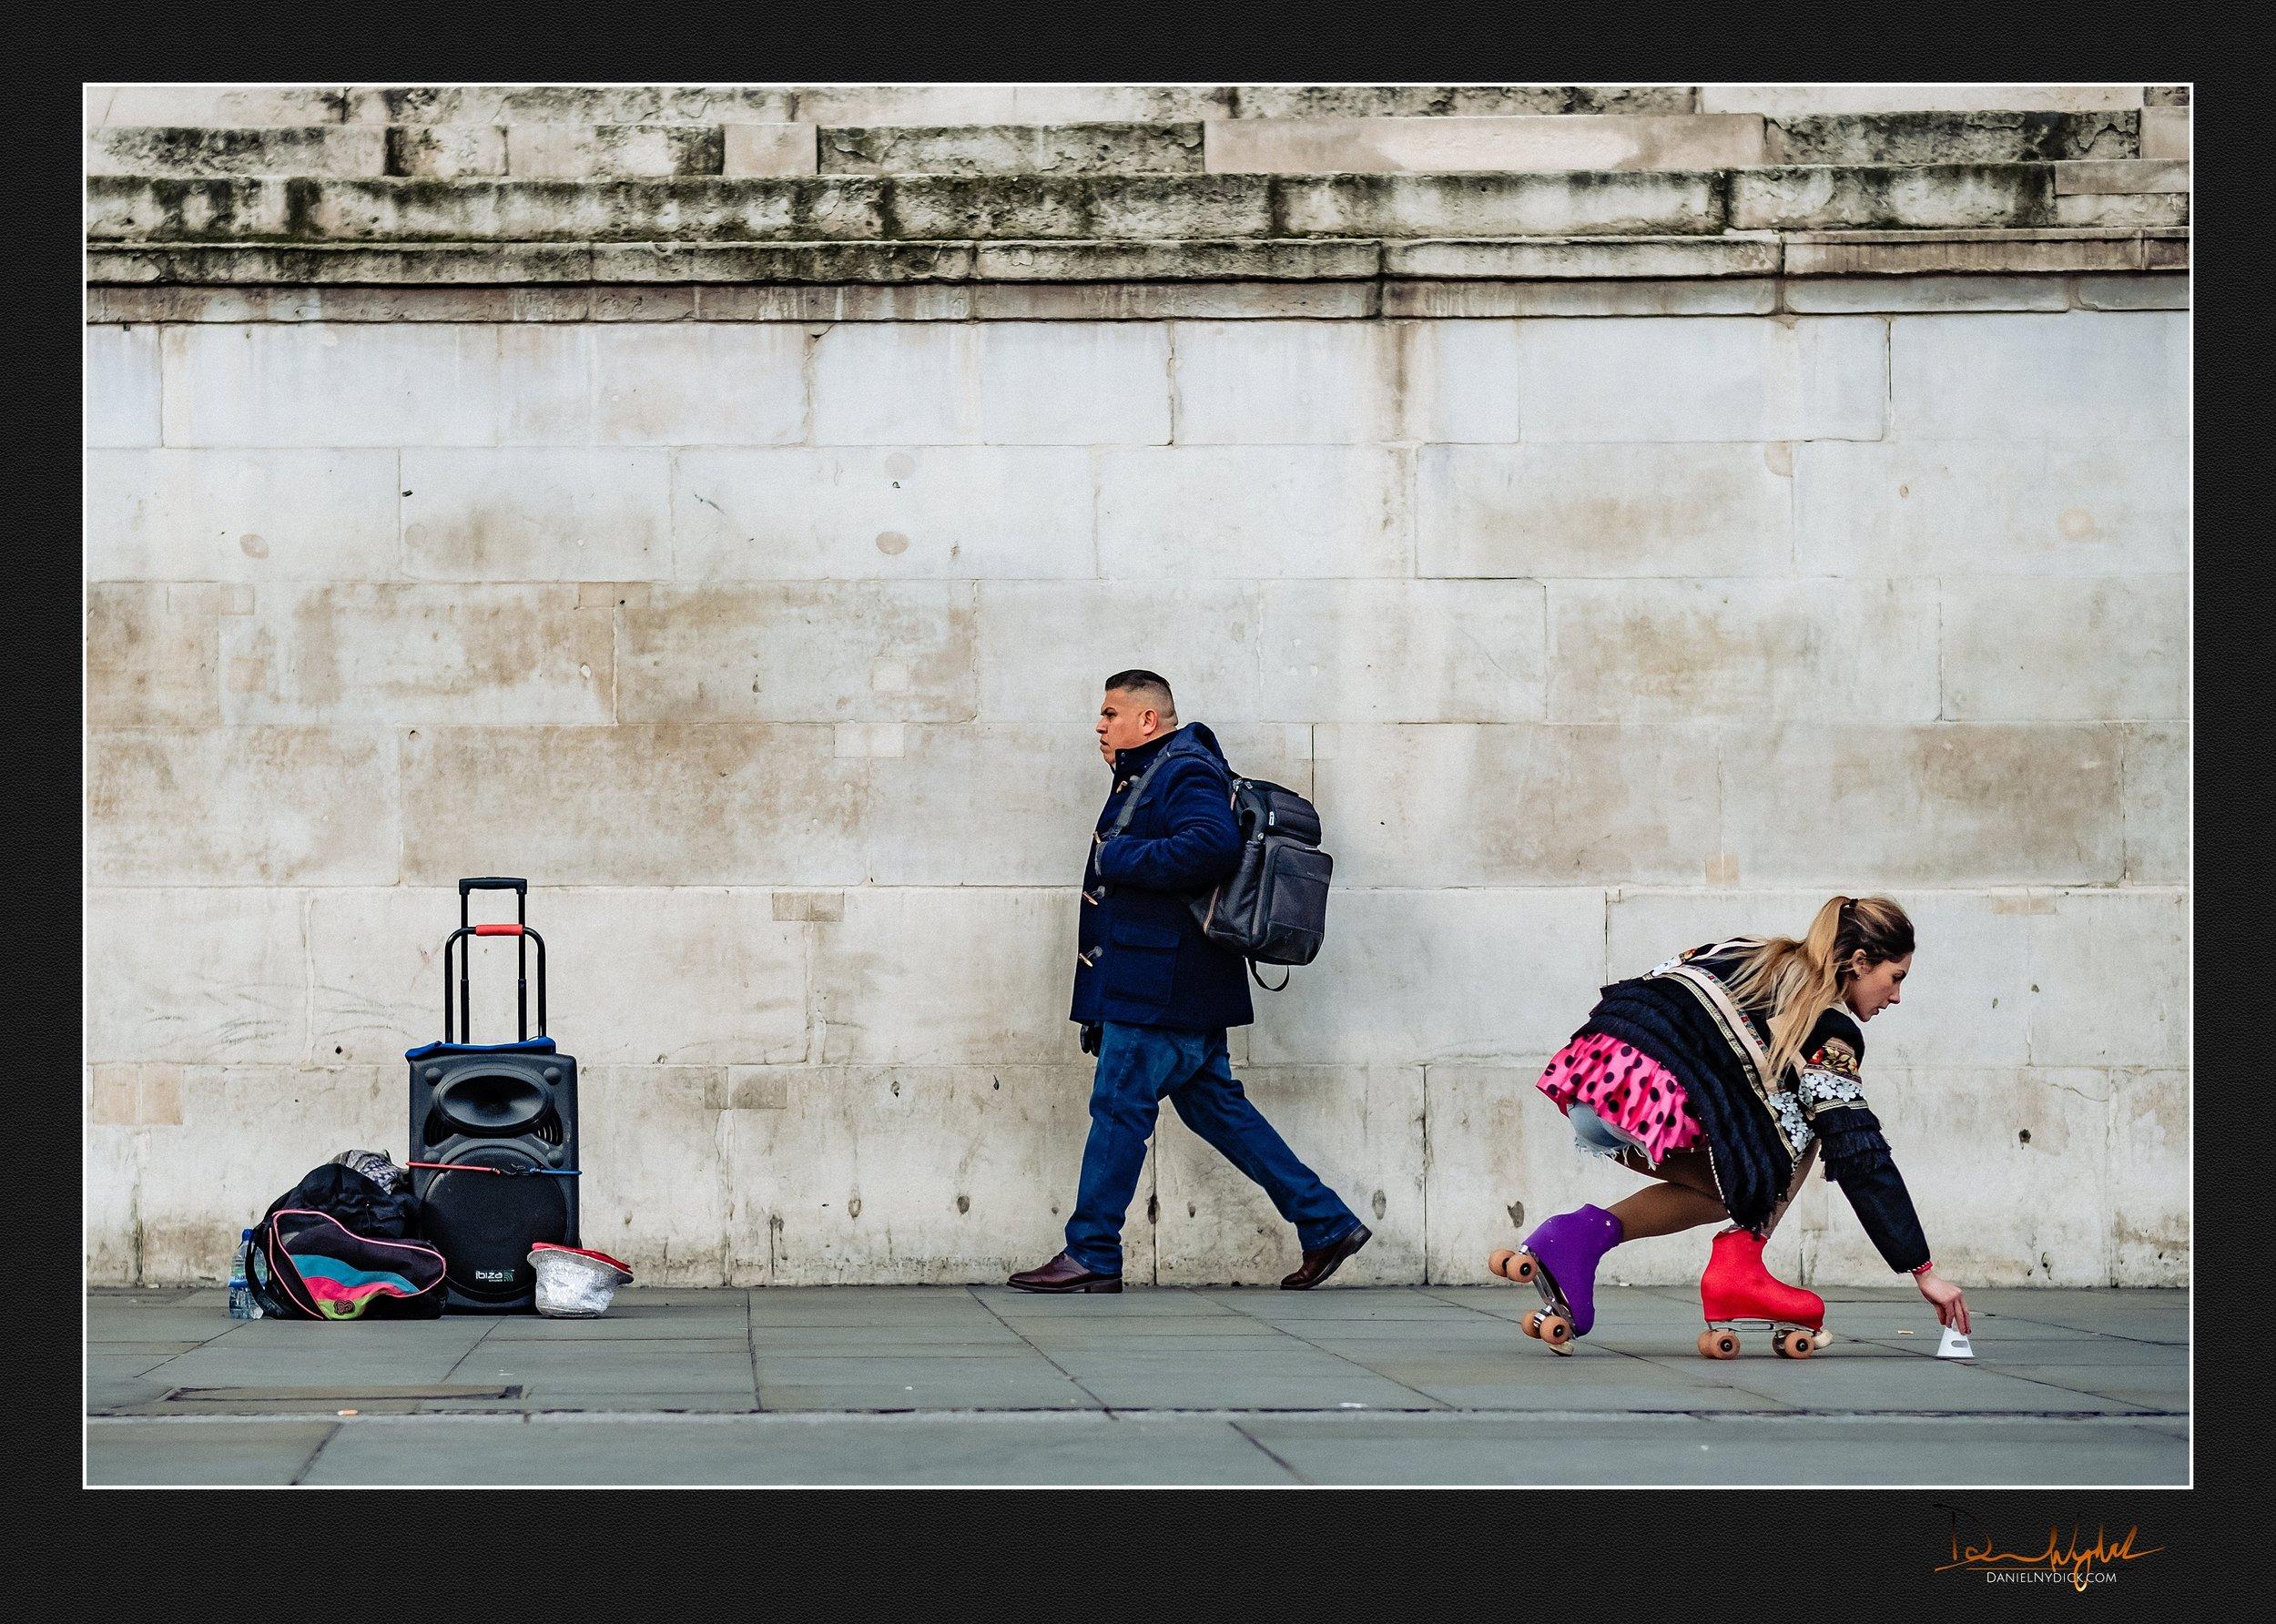 street scenes, people, candid, rollersakte, man walking, picking